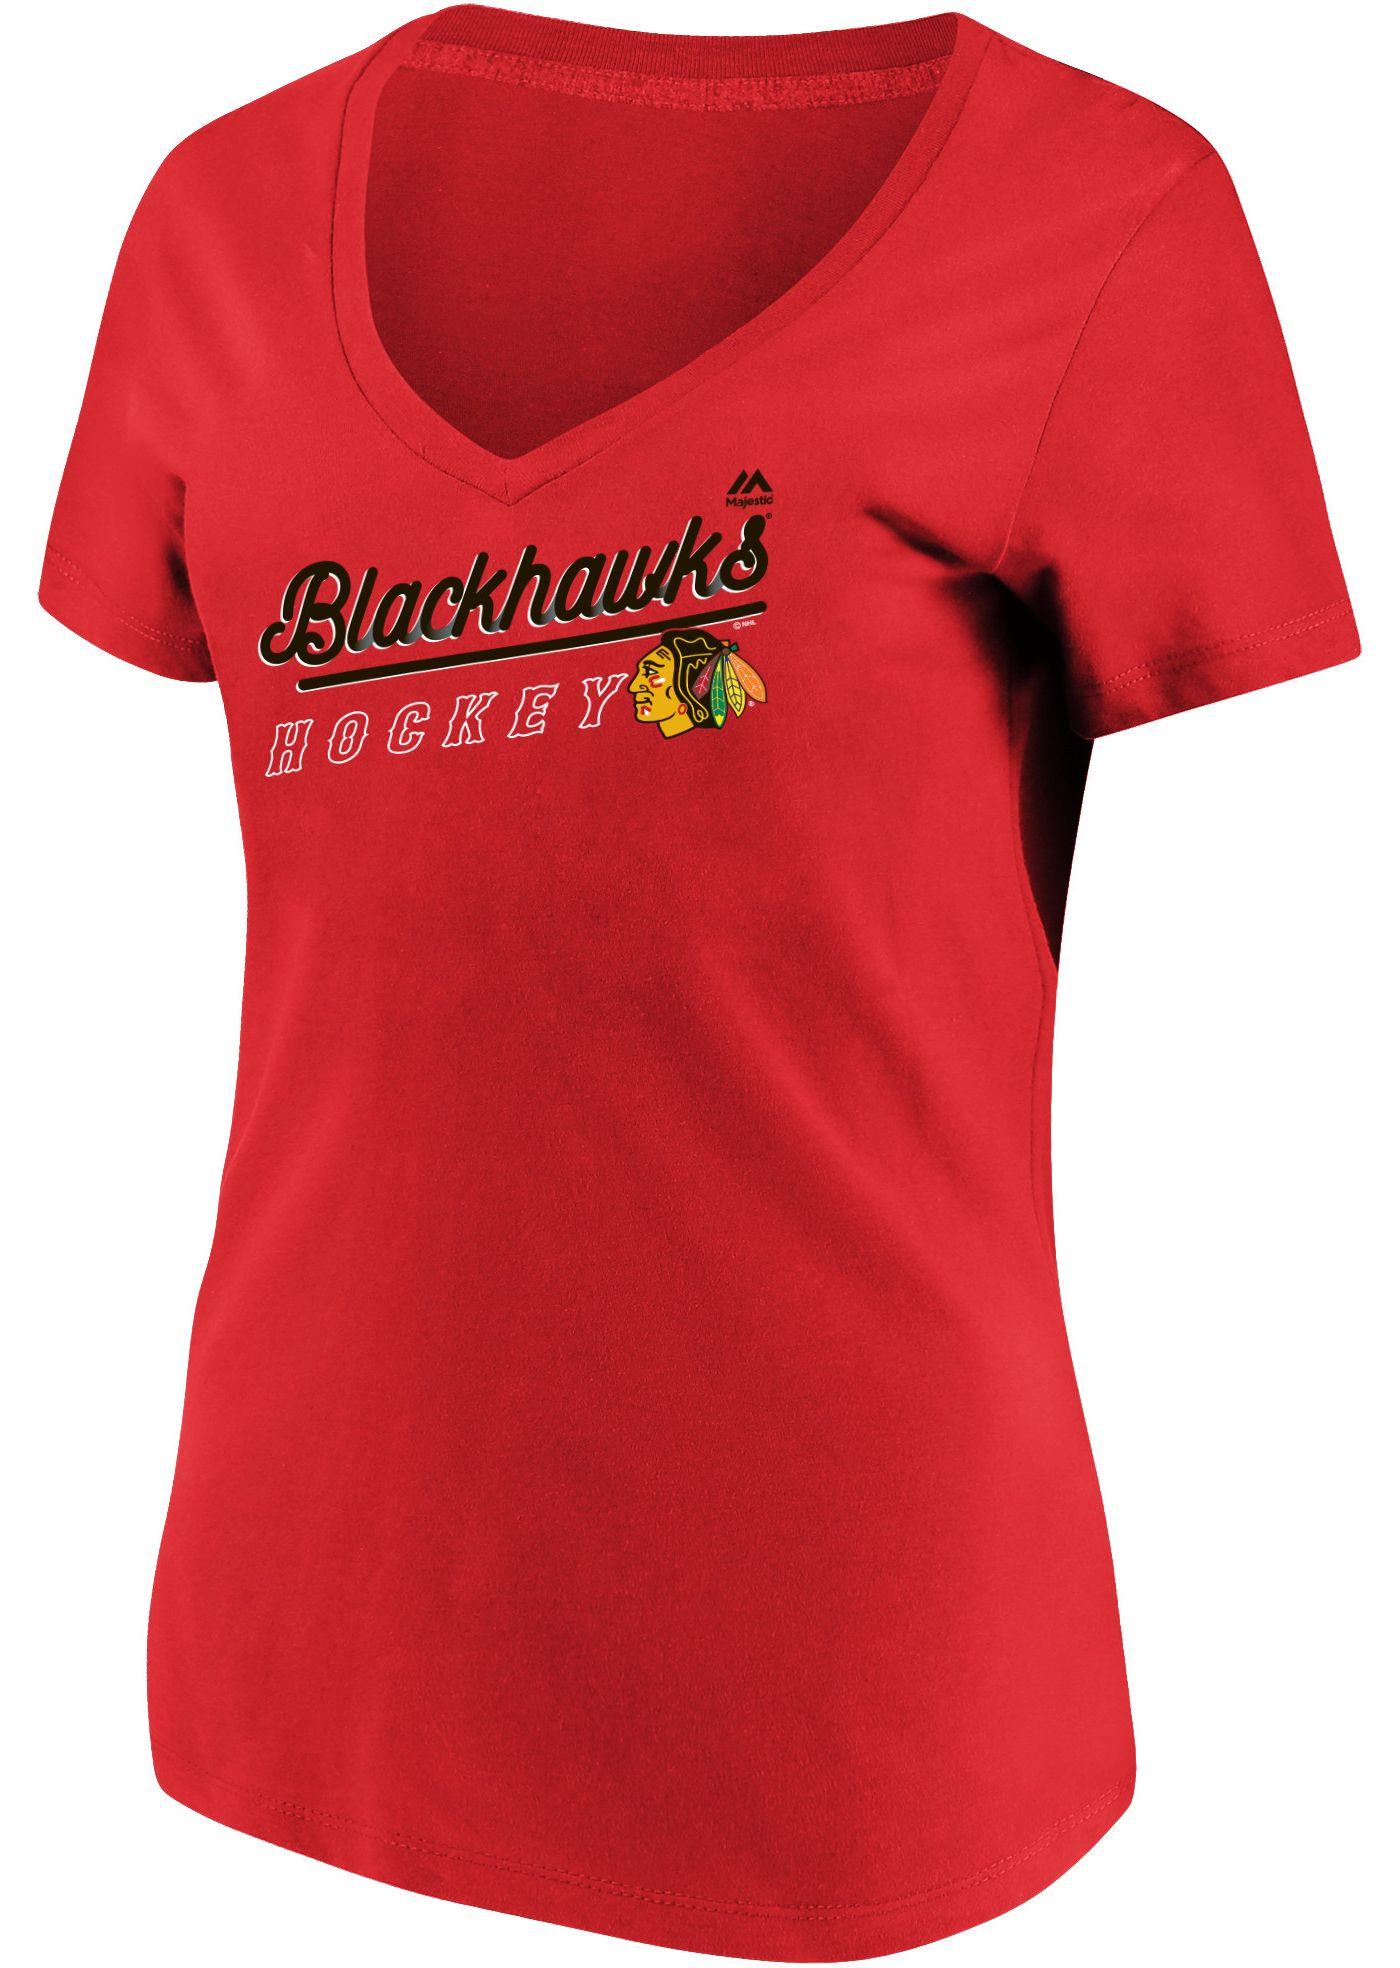 Majestic Women's Chicago Blackhawks Goal Cage Red V-Neck T-Shirt